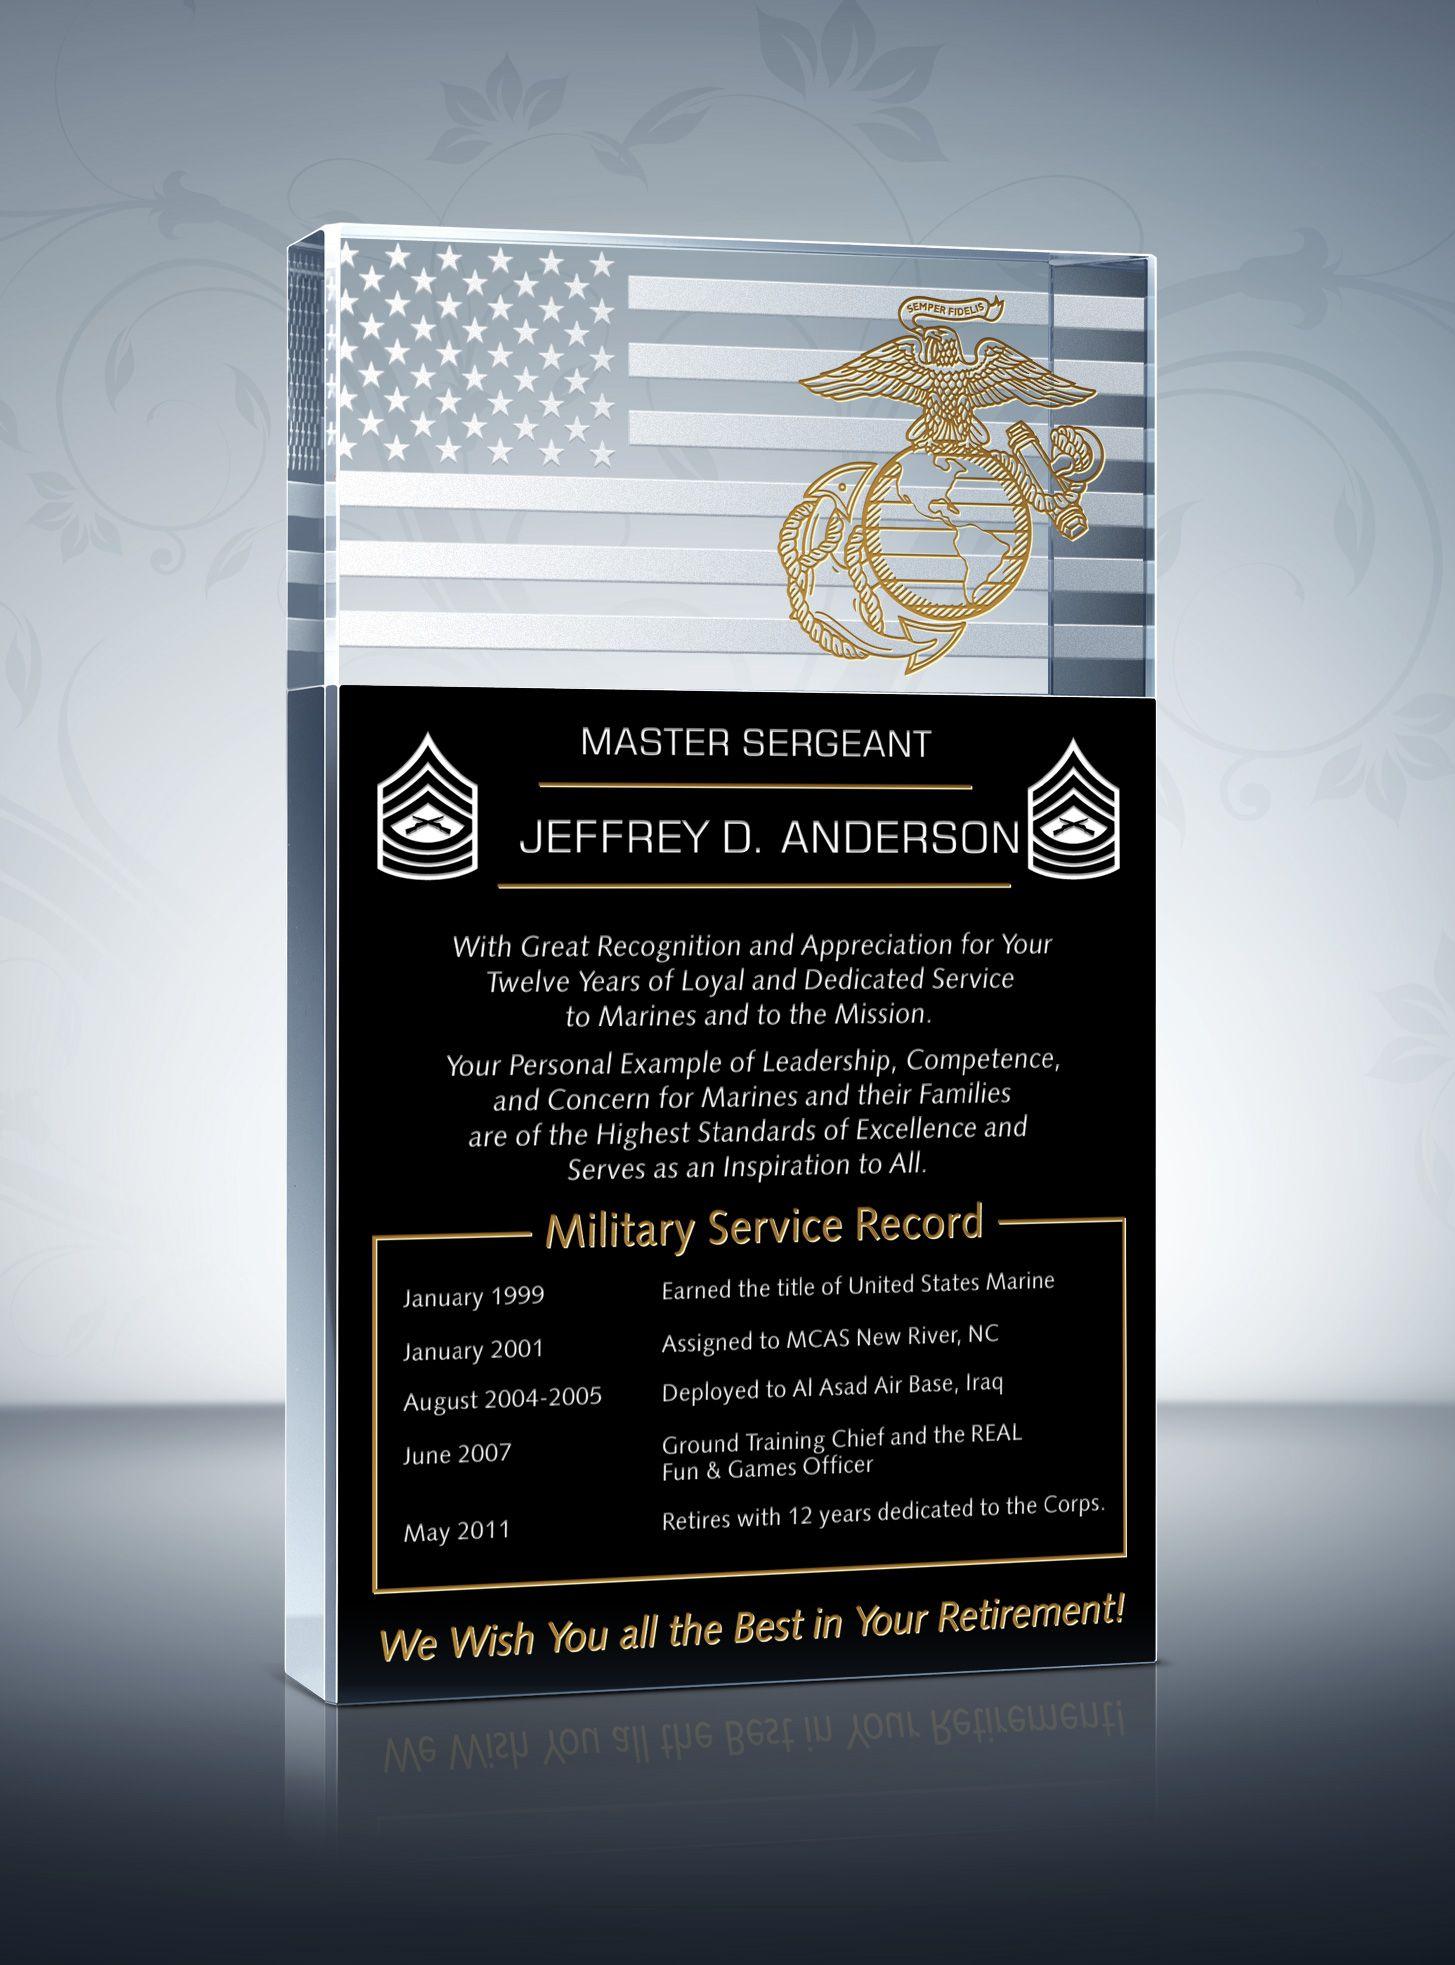 Marine Corps Retirement Plaque and Poem Samples | Marine ...